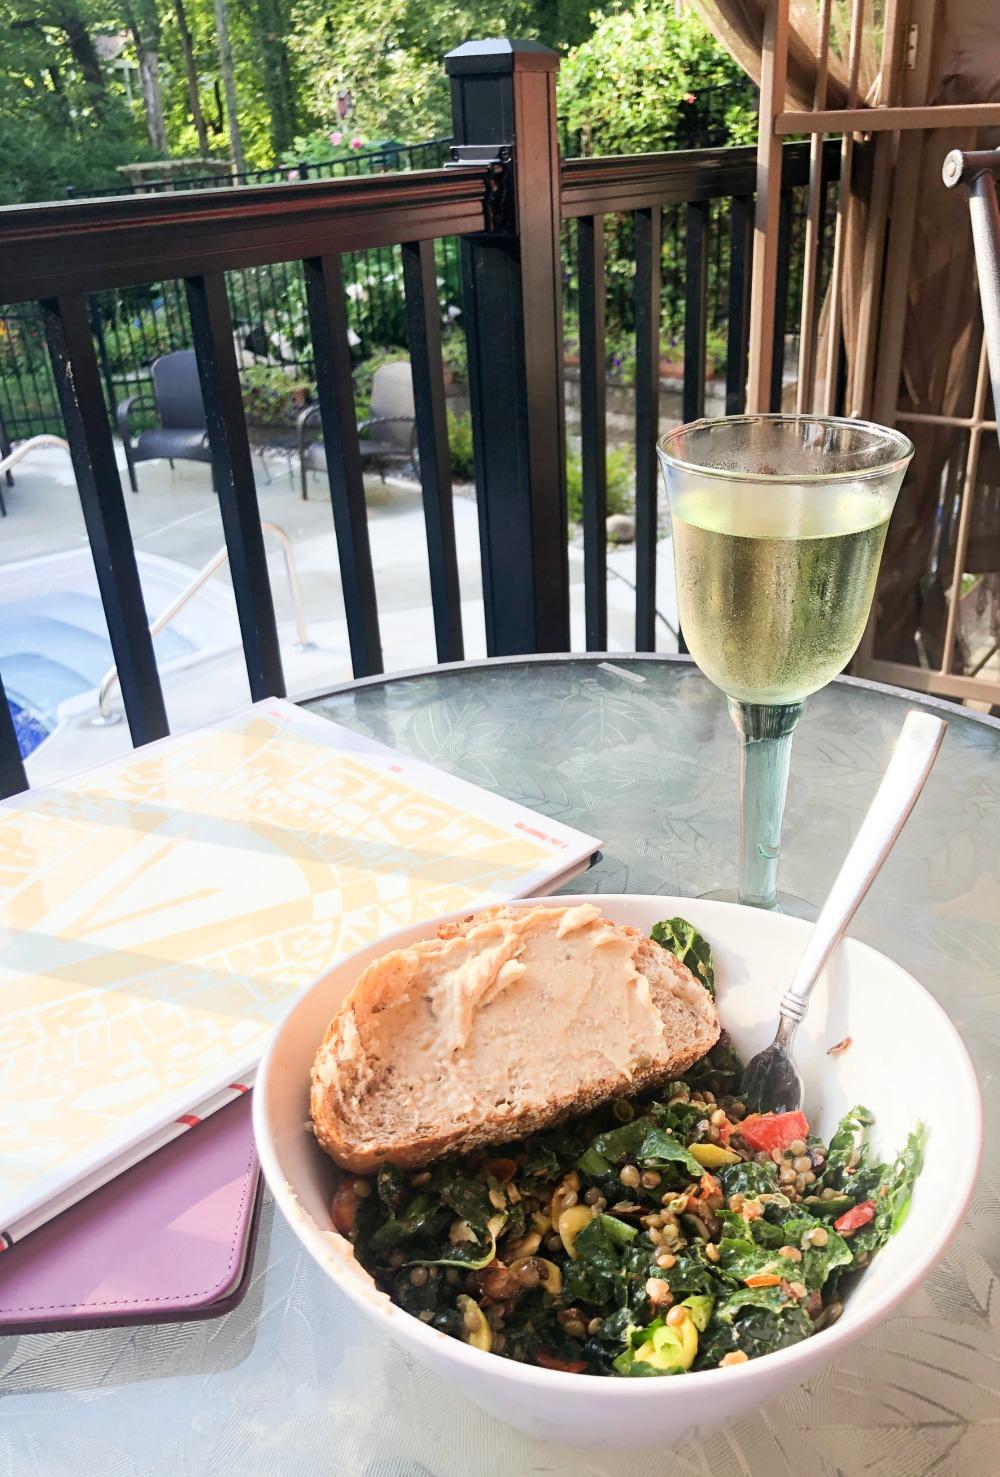 Lentil Salad Recipe from Bon Appetit I DreaminLace.com #Salad #VeganRecipes #RecipeoftheDay